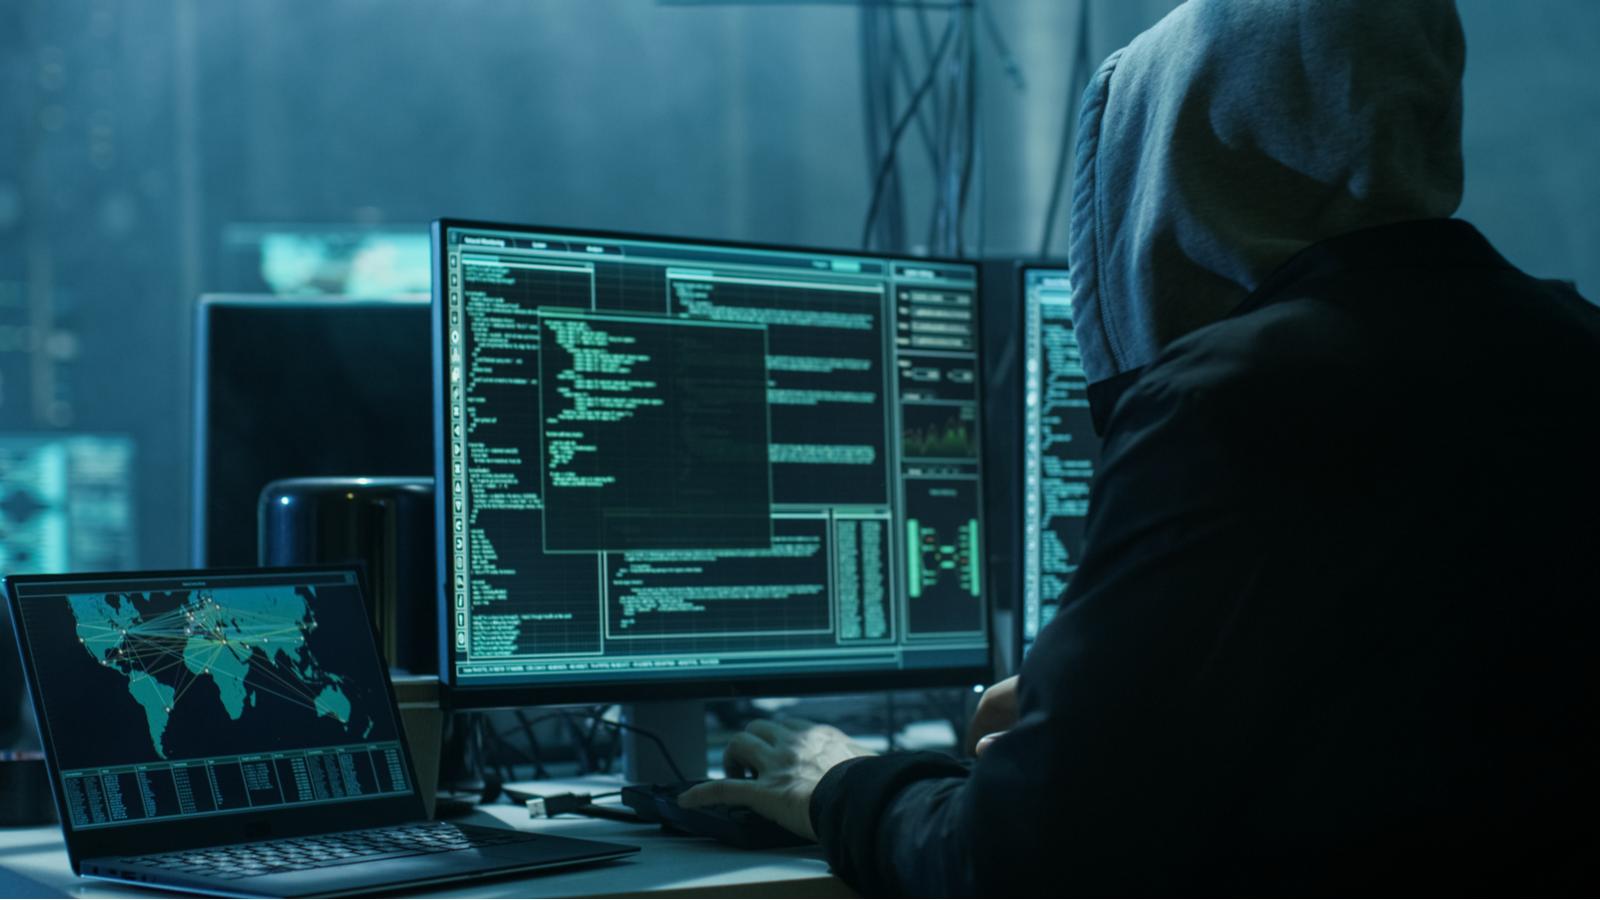 Dangerous hooded hacker breaks into data server